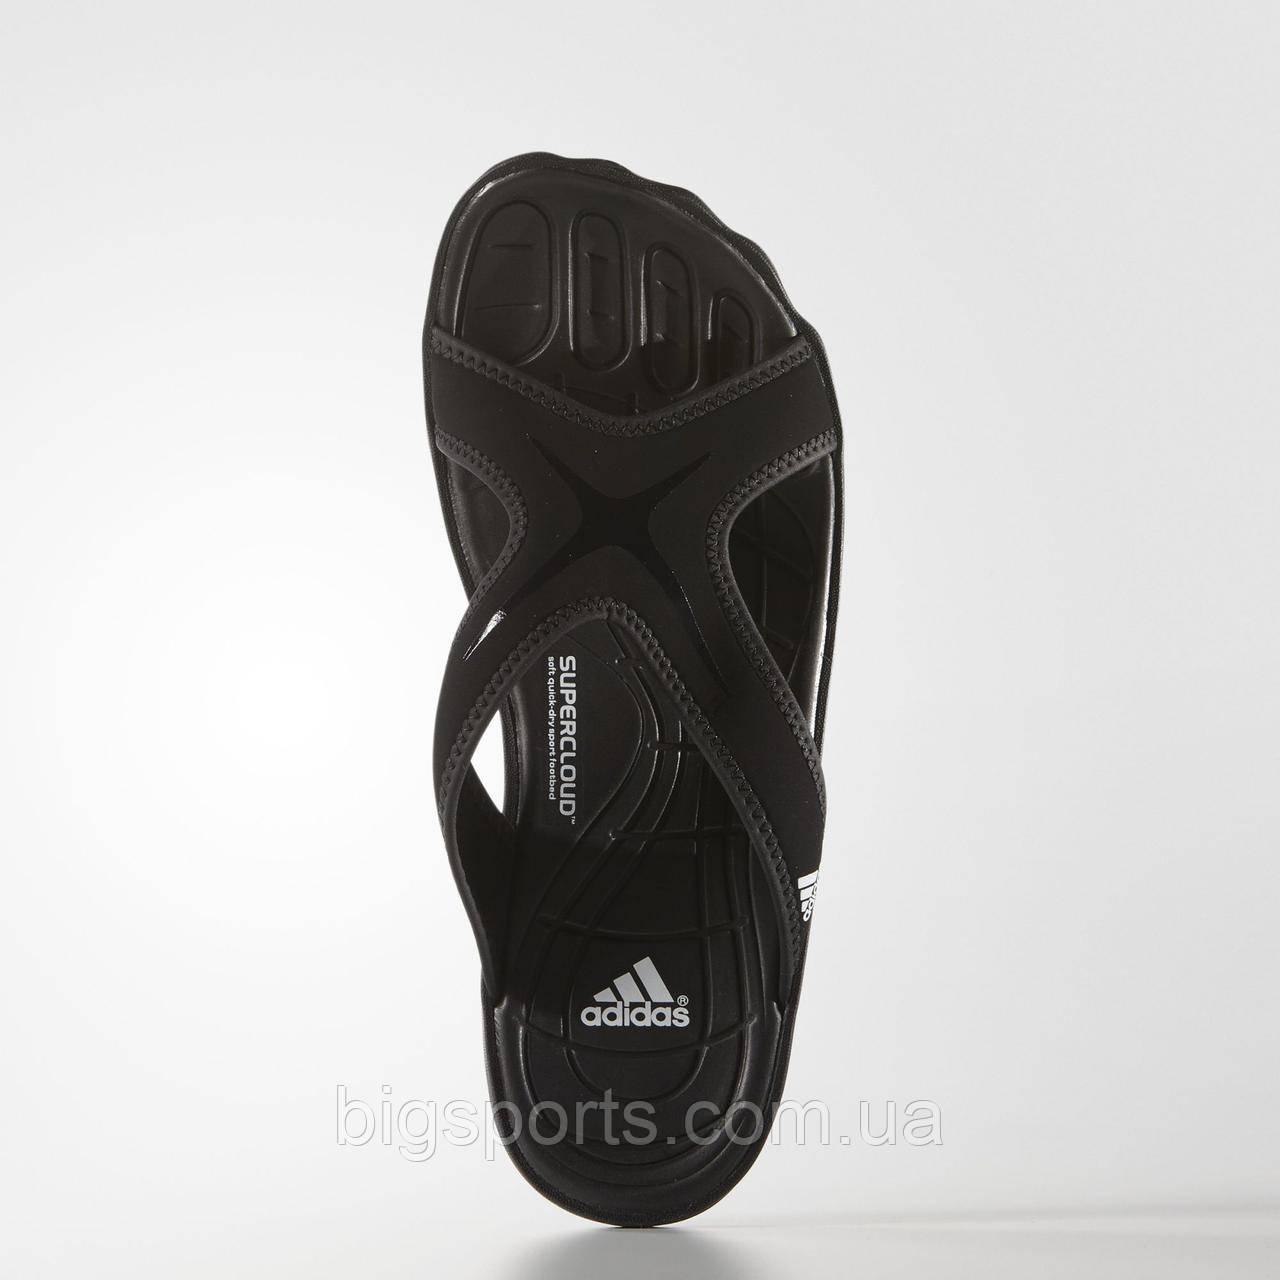 Тапки муж. Adidas adiPure Slide SC (арт. V21529)